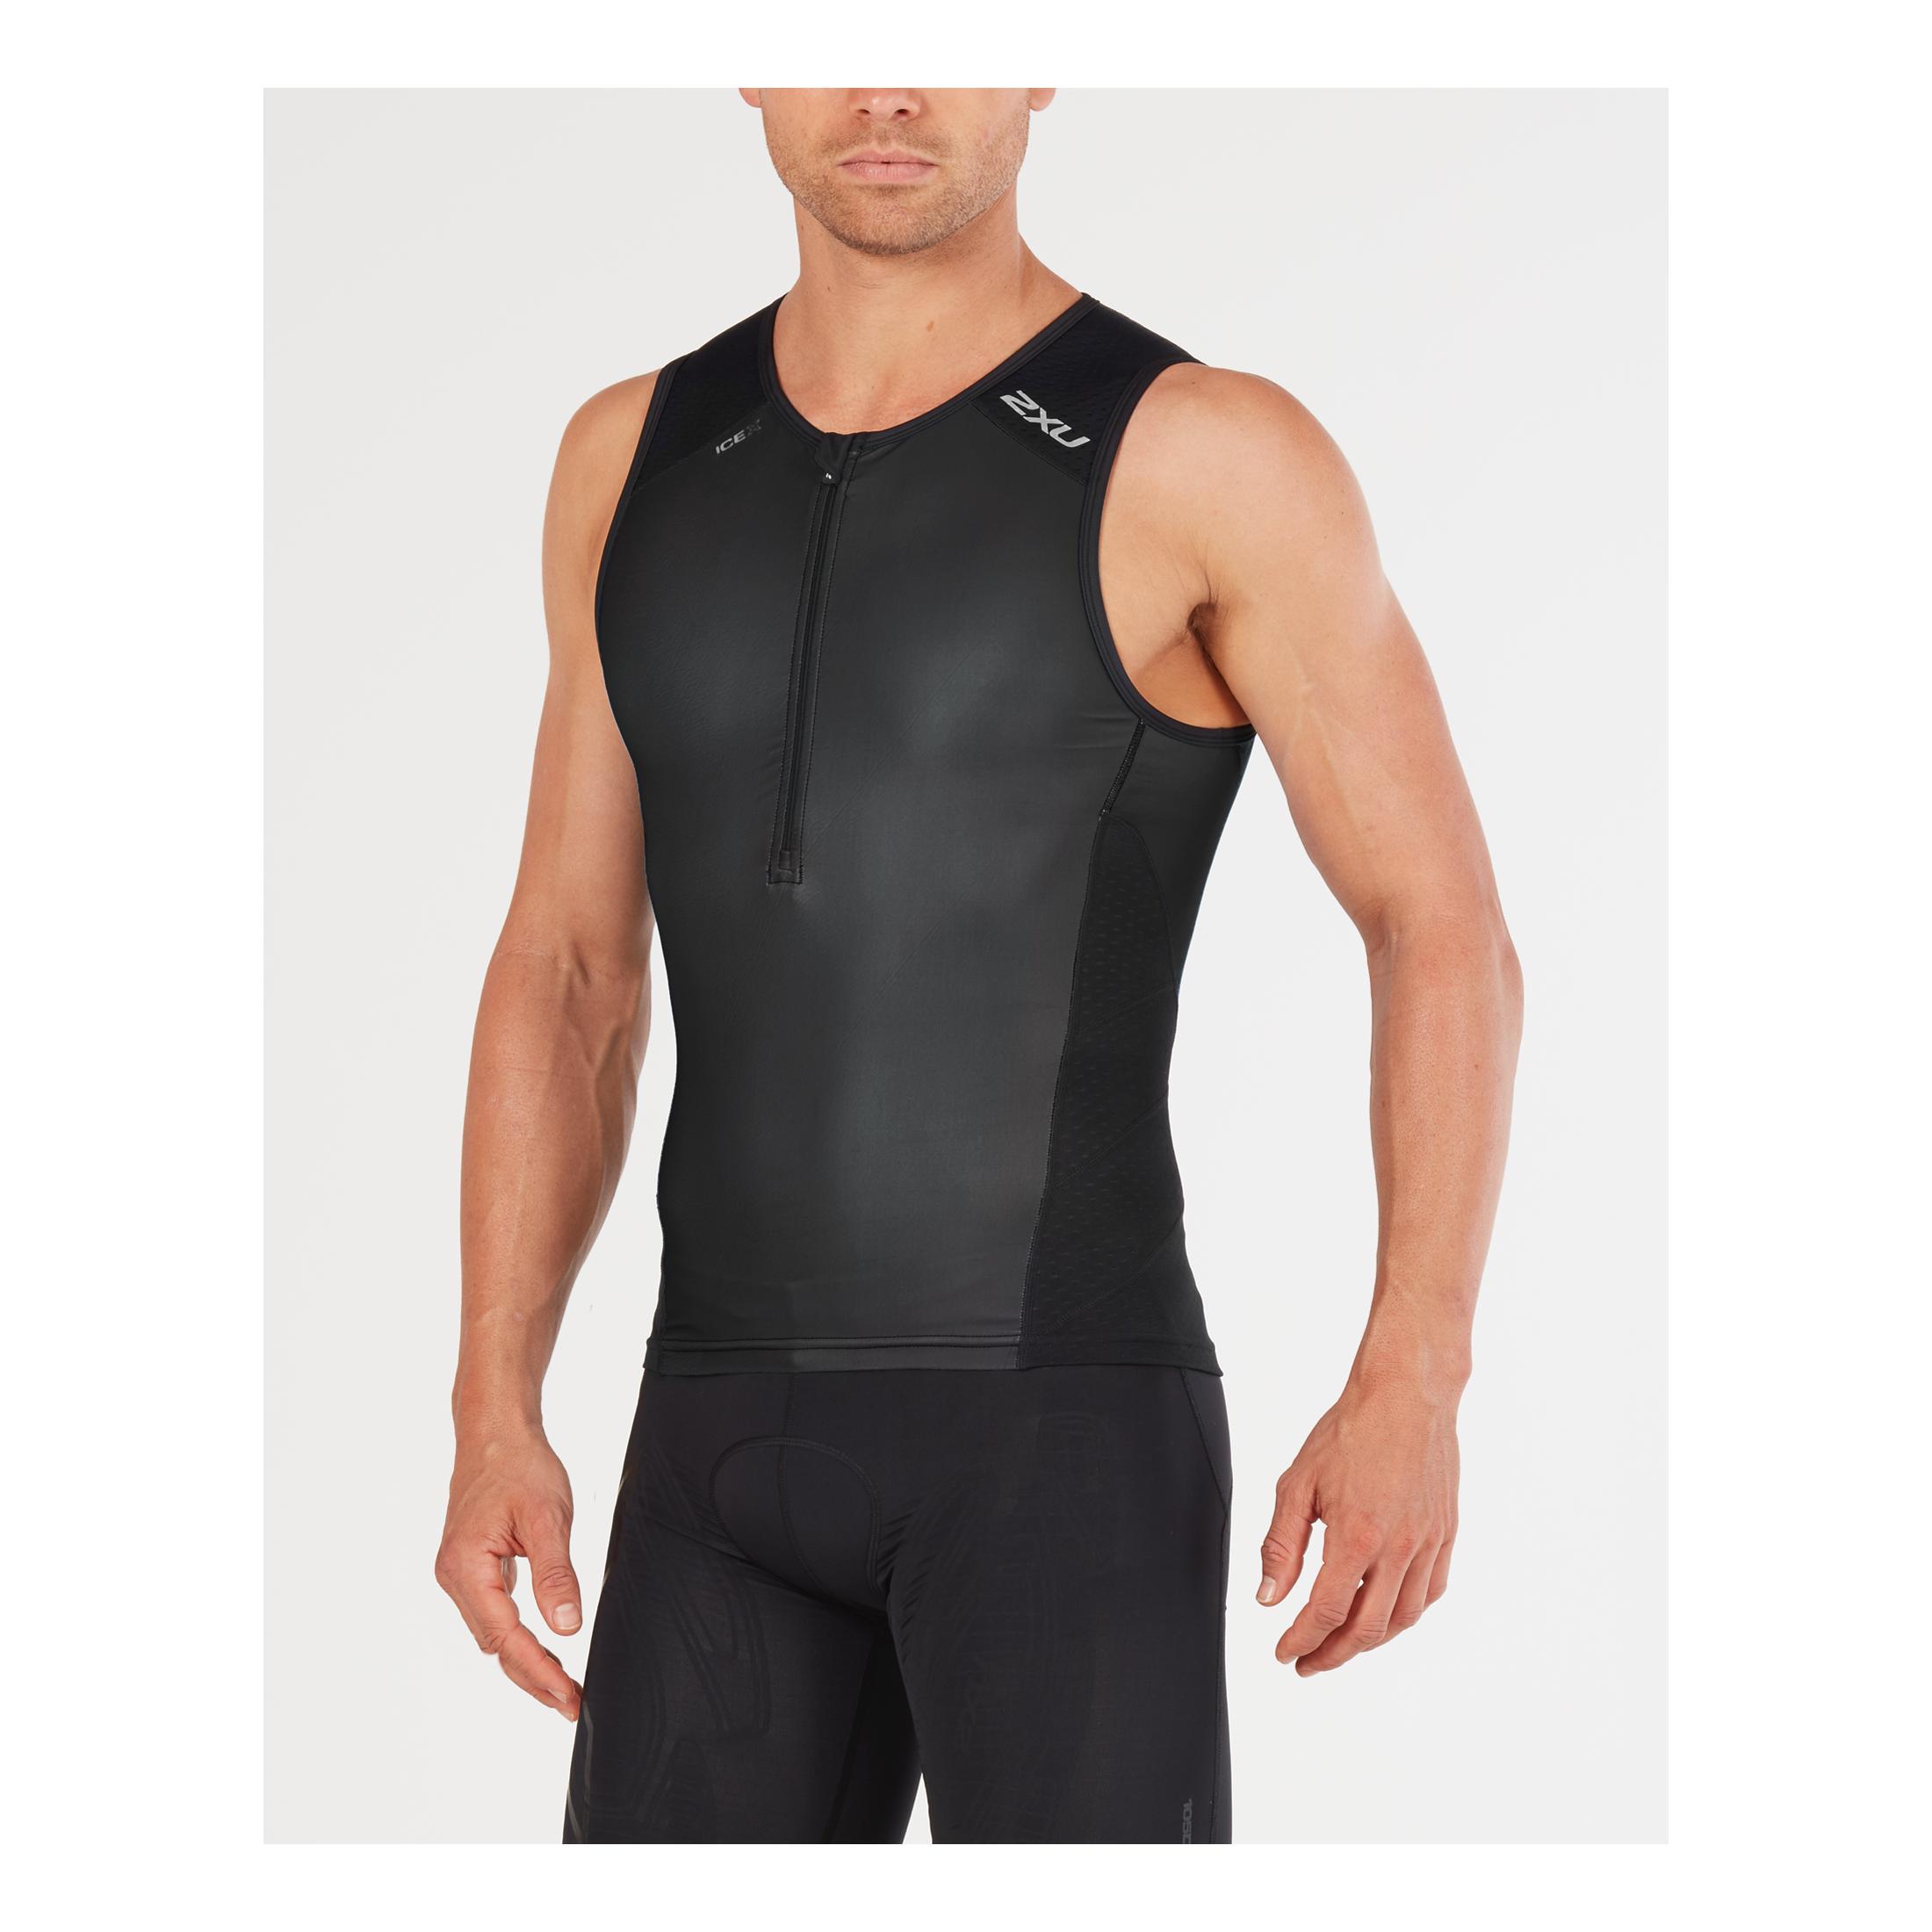 Men/'s Sleeveless Triathlon Singlet by Kinetik Color Black Size Medium